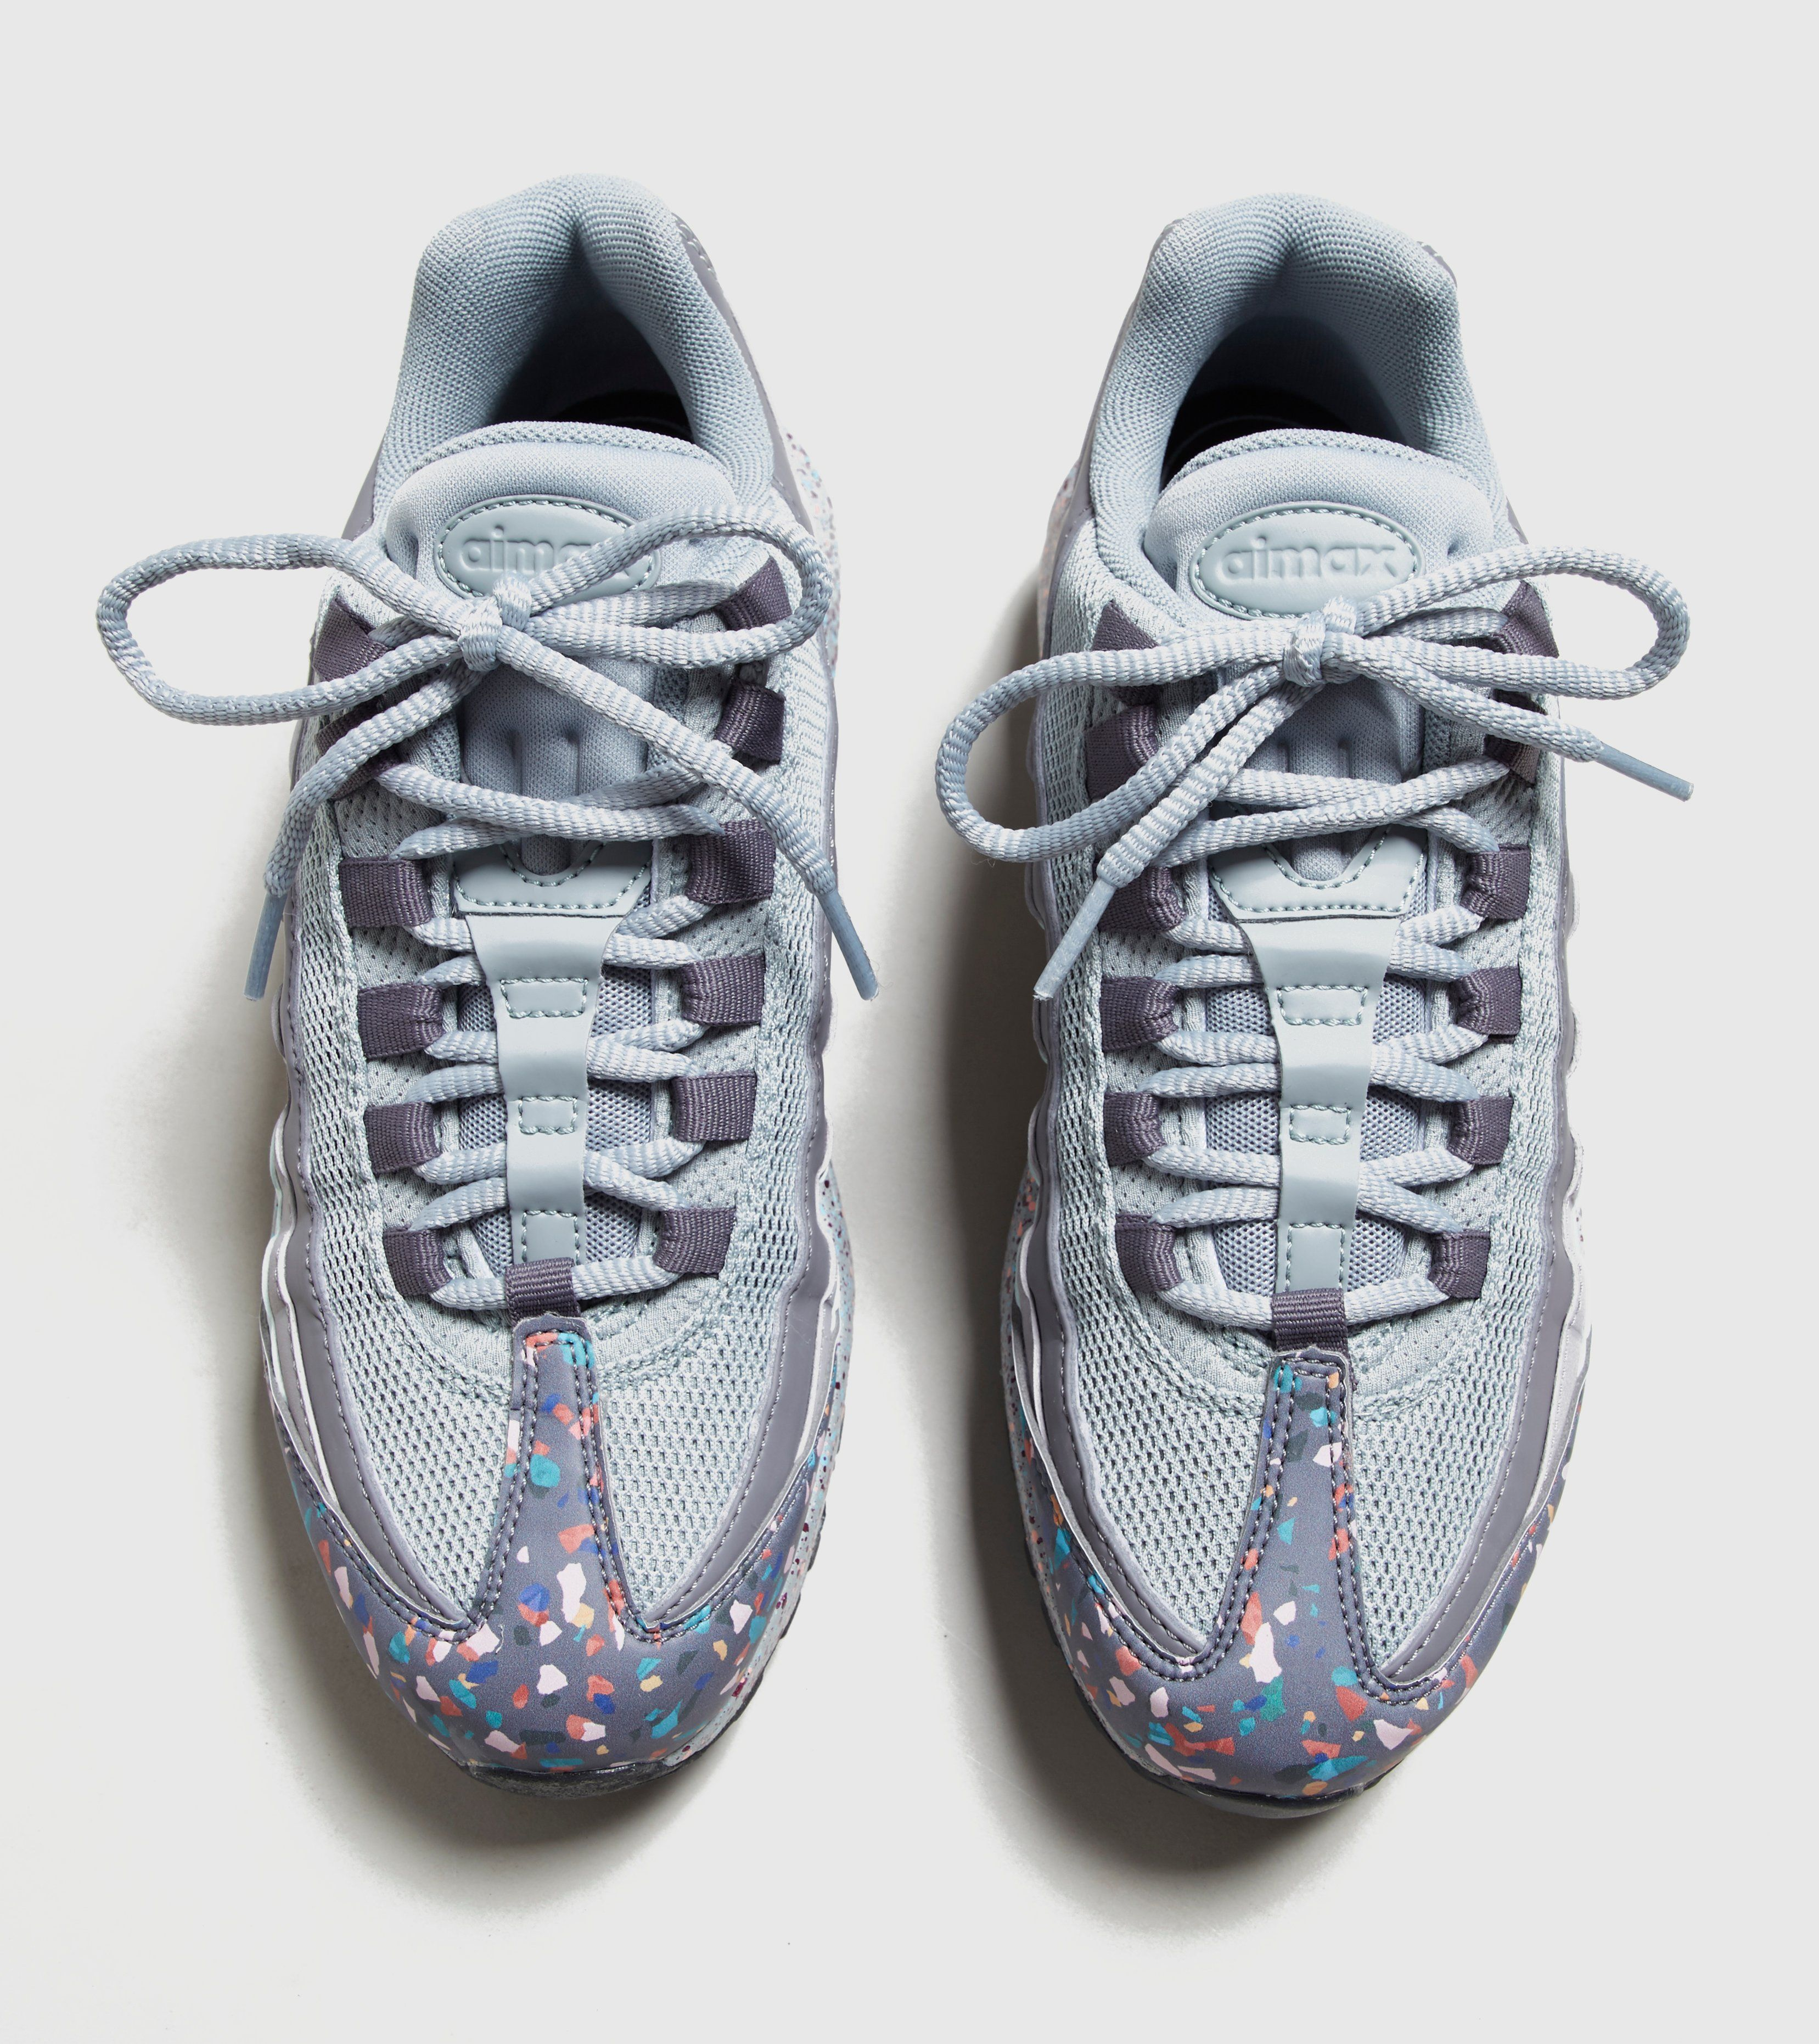 Nike Air Max 95 Terrazzo Women's